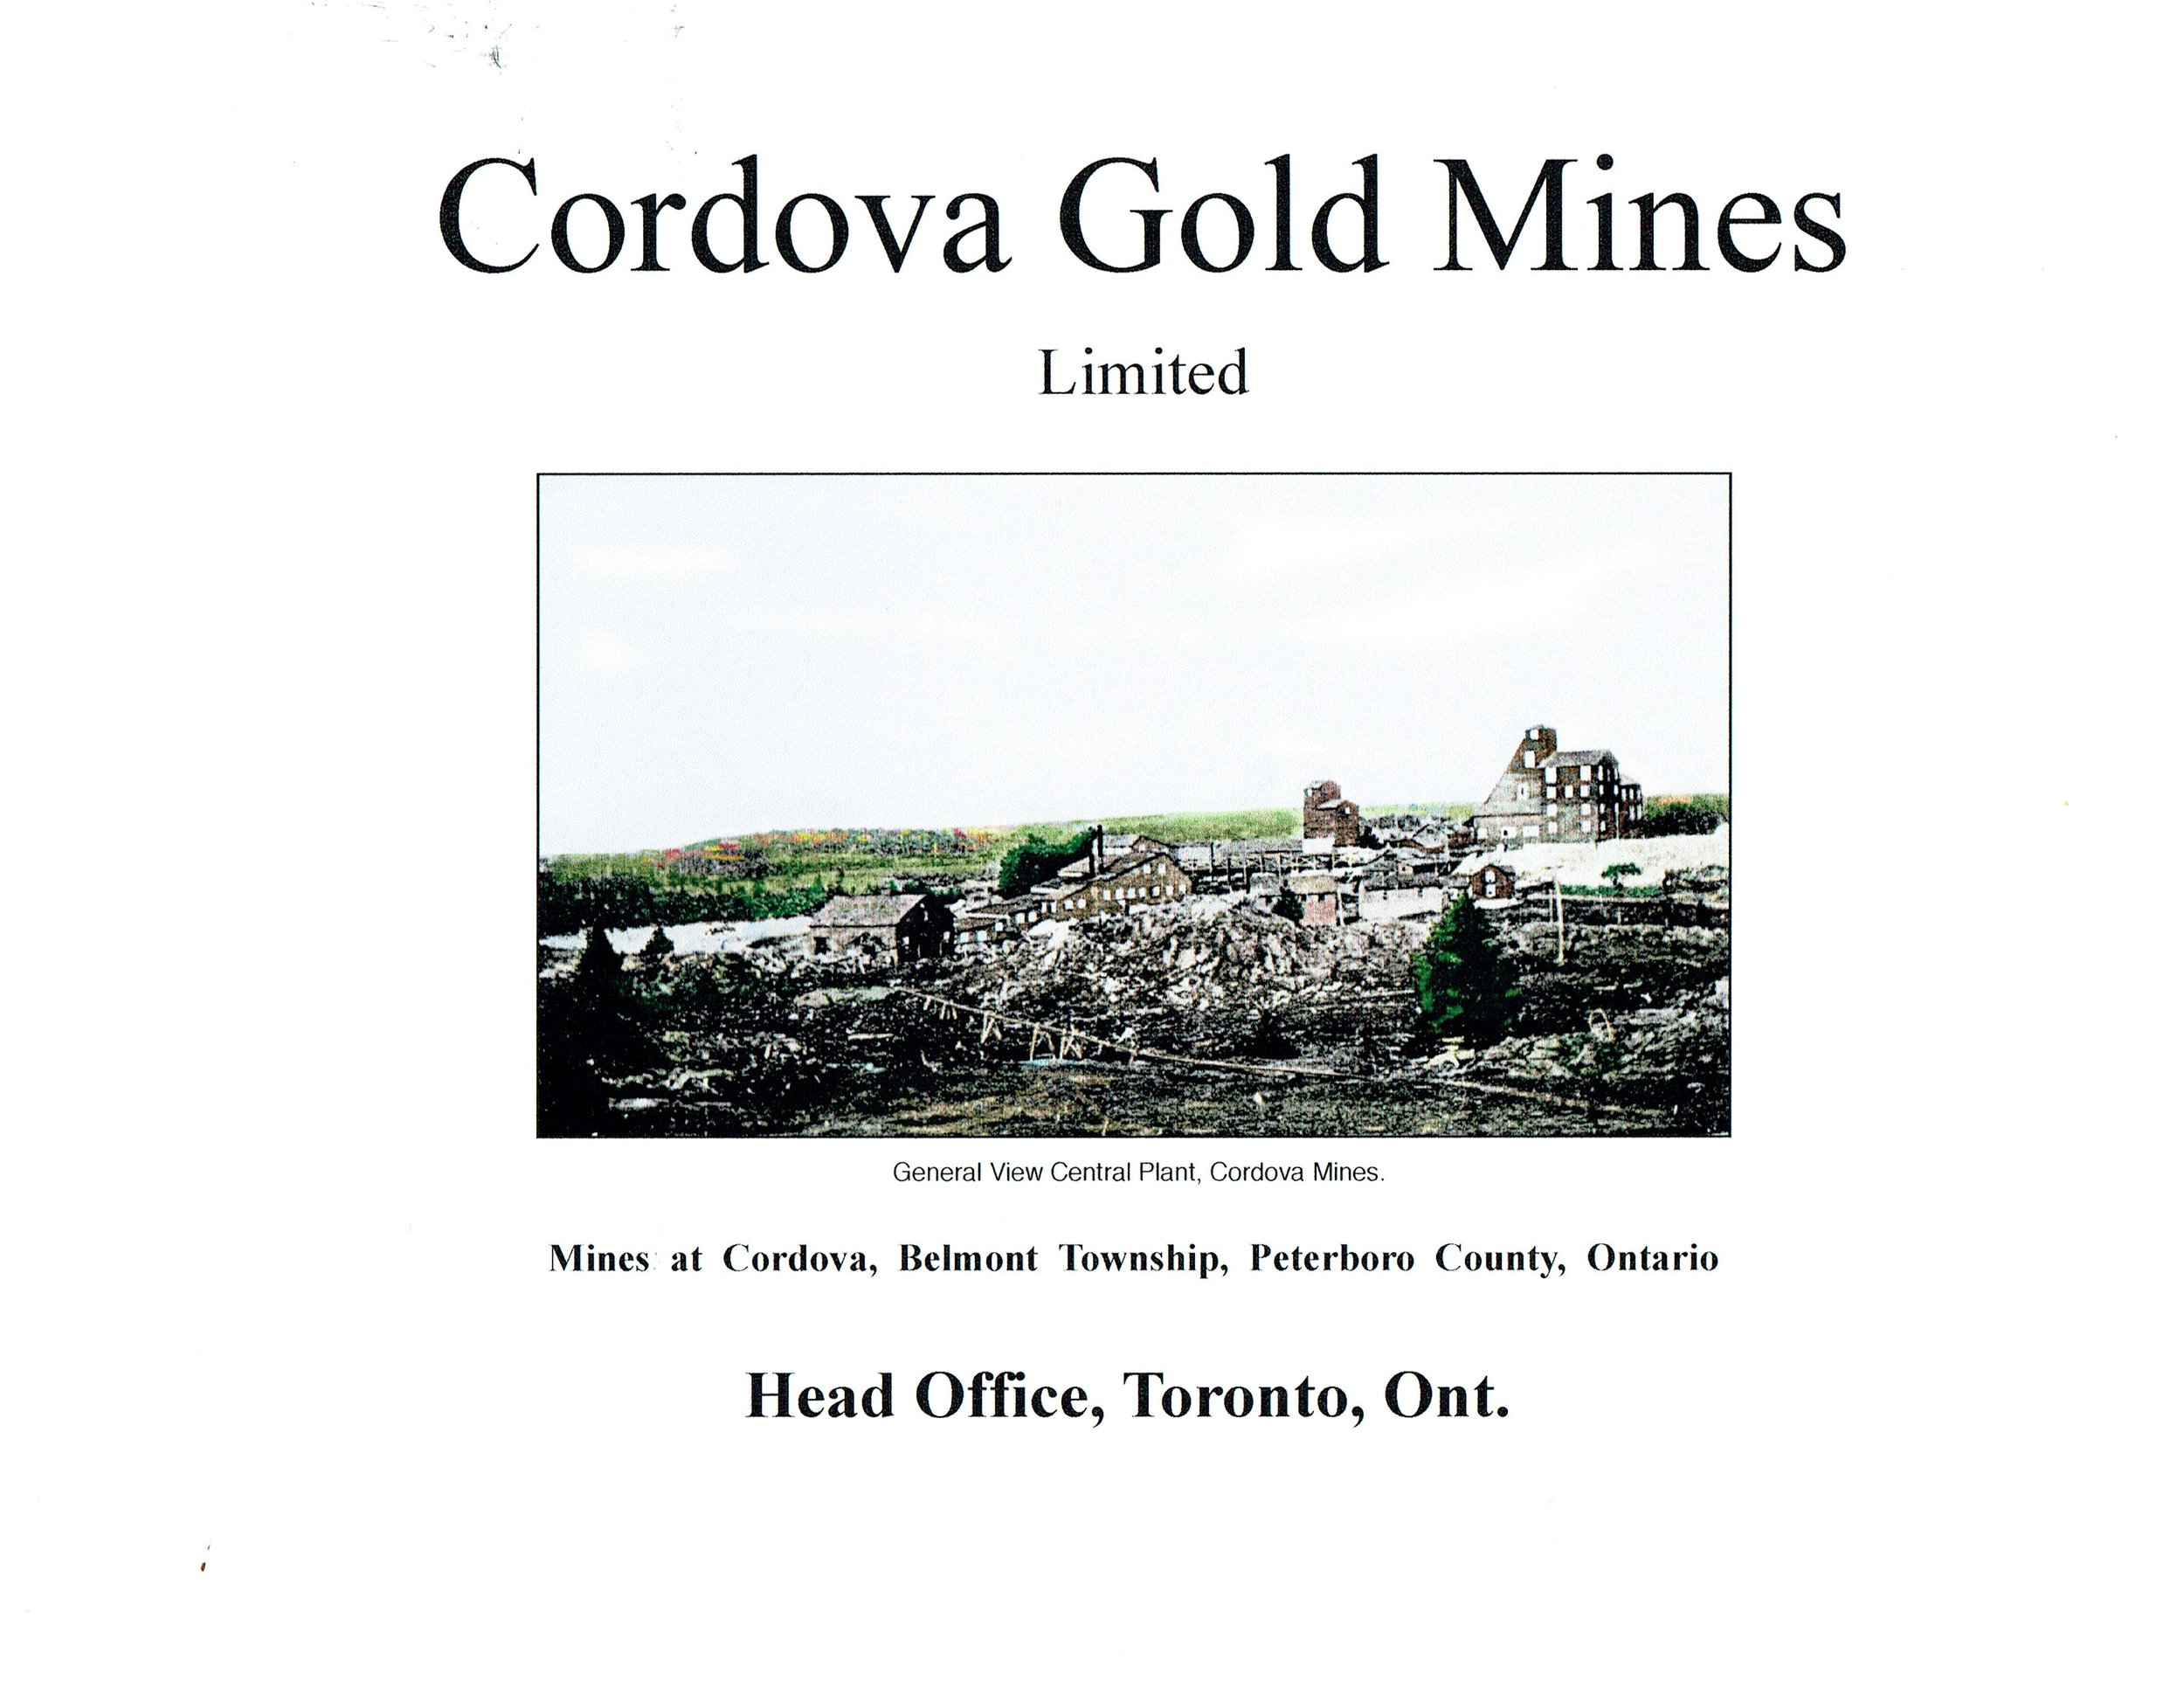 Cordova Mine prospetus cover.jpg